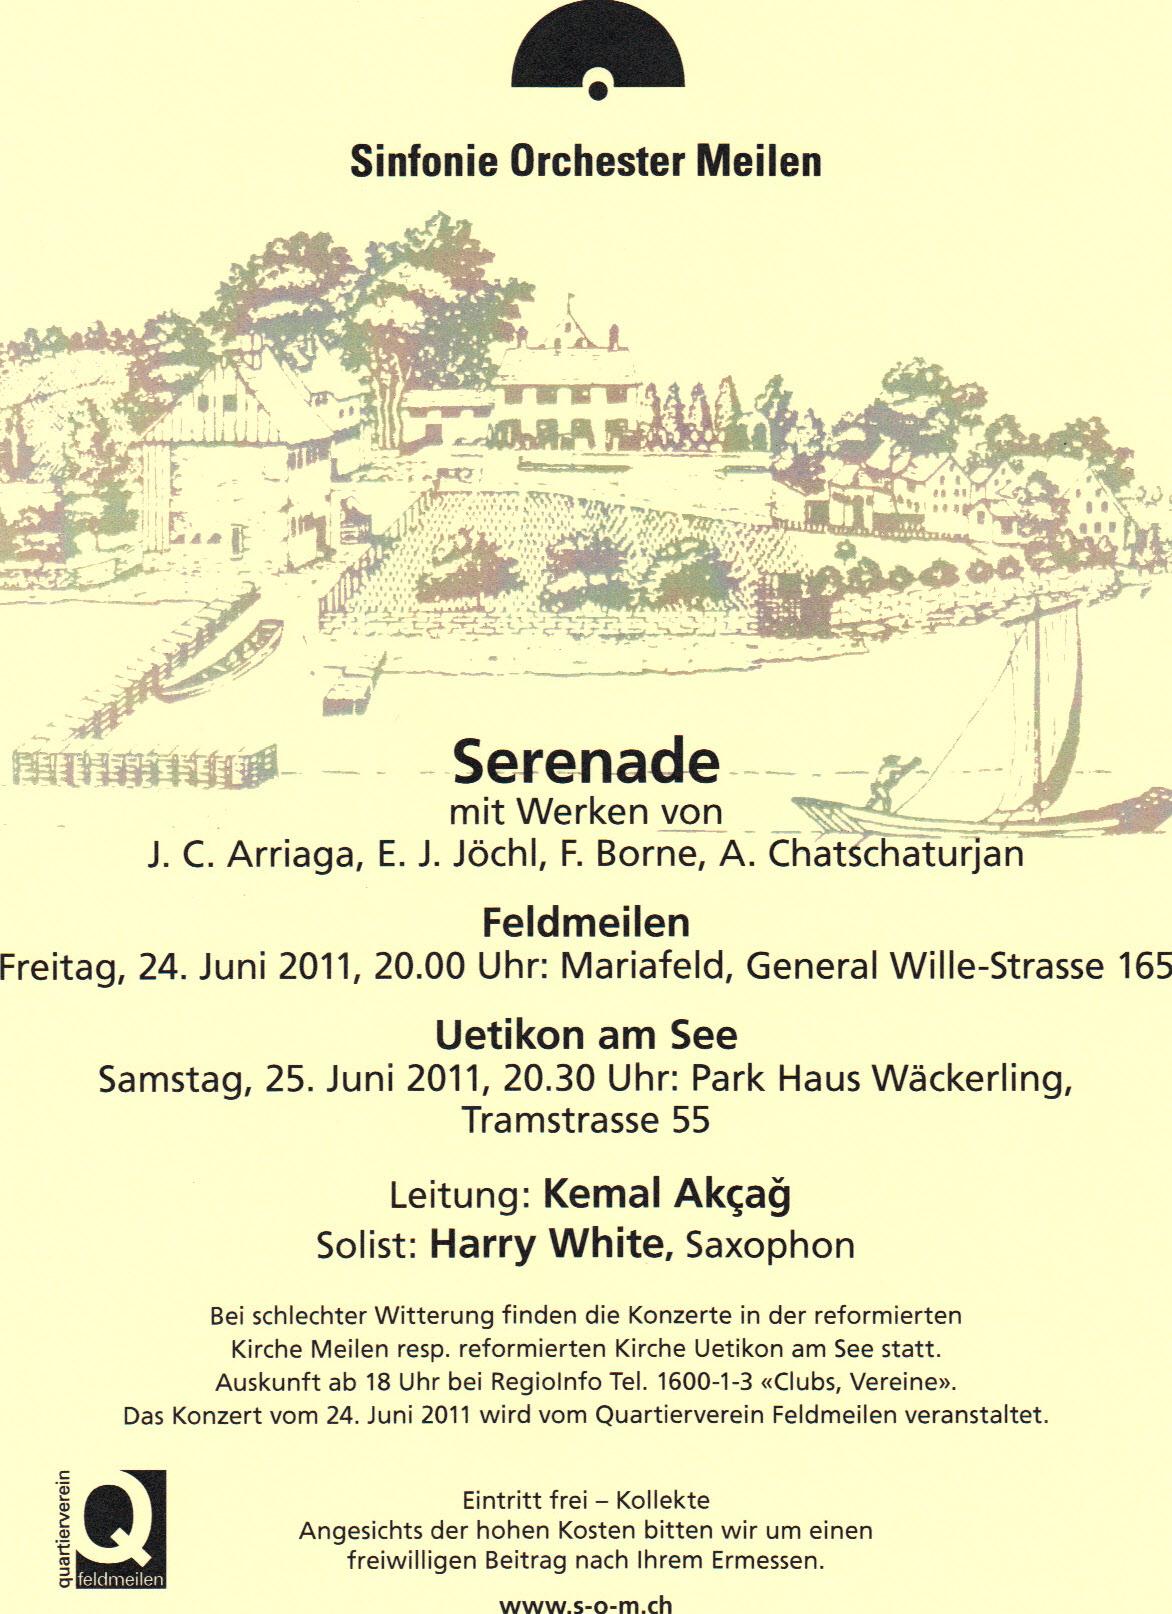 Plakat Sinfonieorchester Meilen, 2011